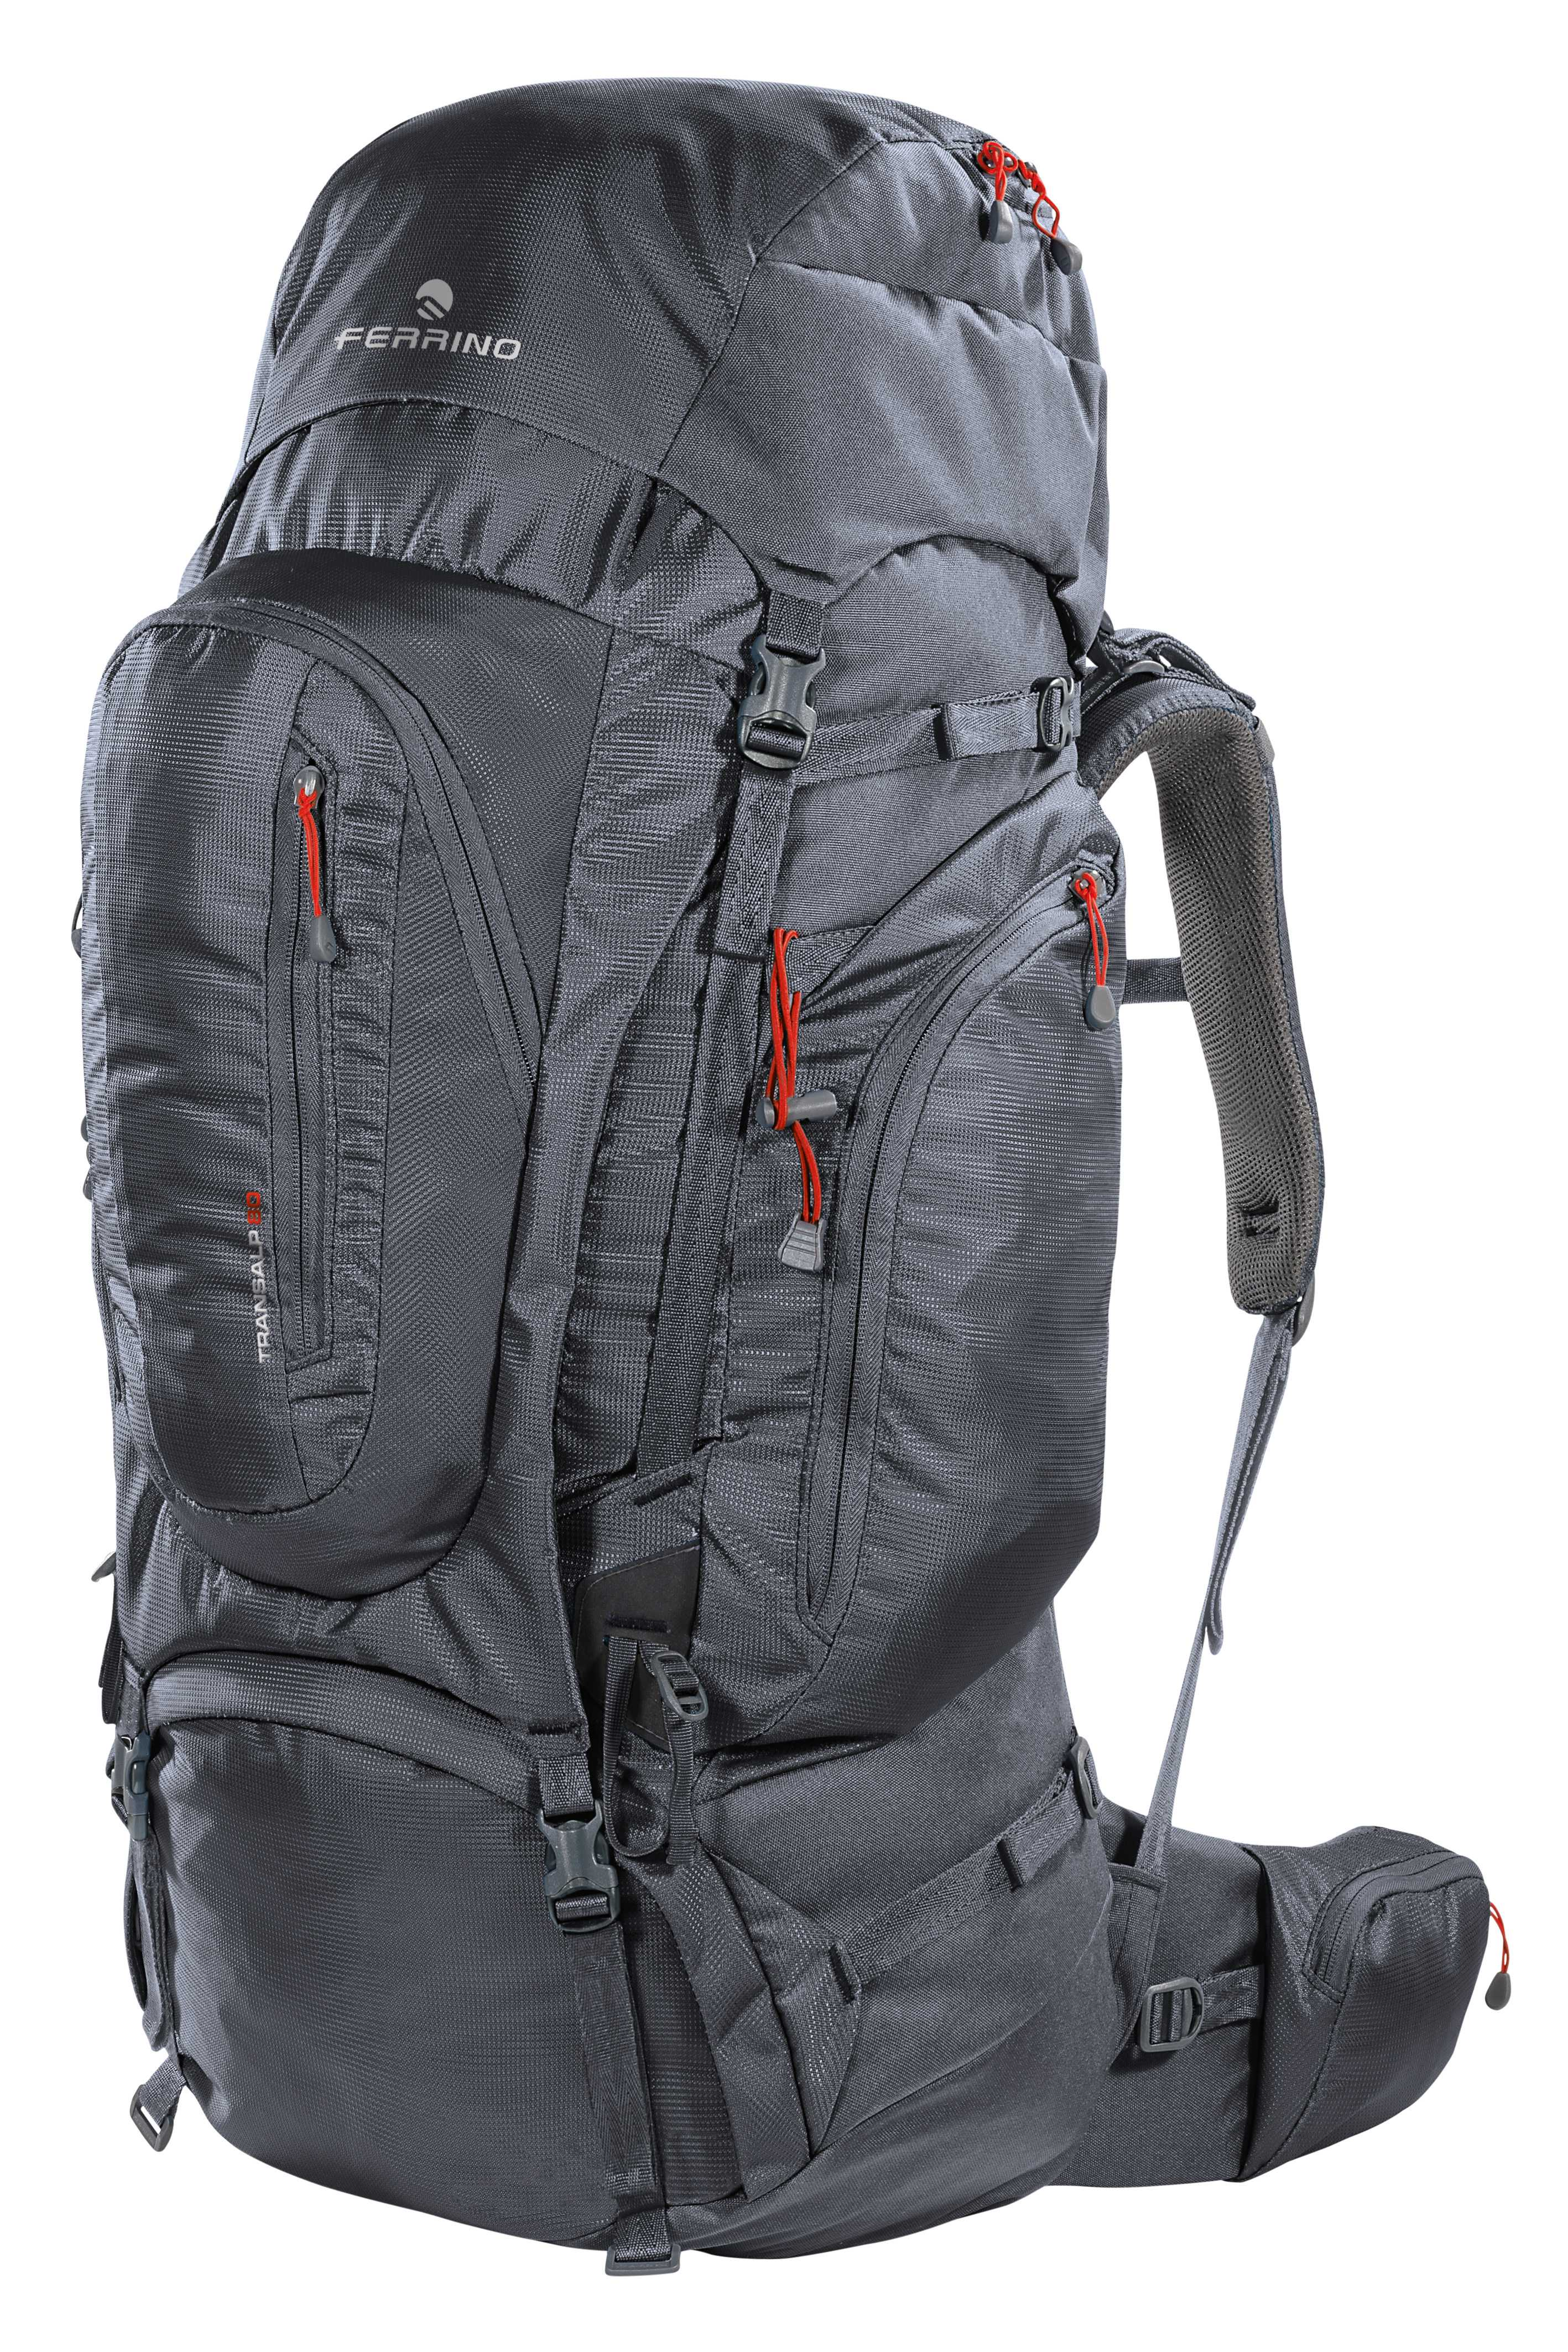 Turistický batoh Ferrino TRANSALP 80 2019 a80b91651e